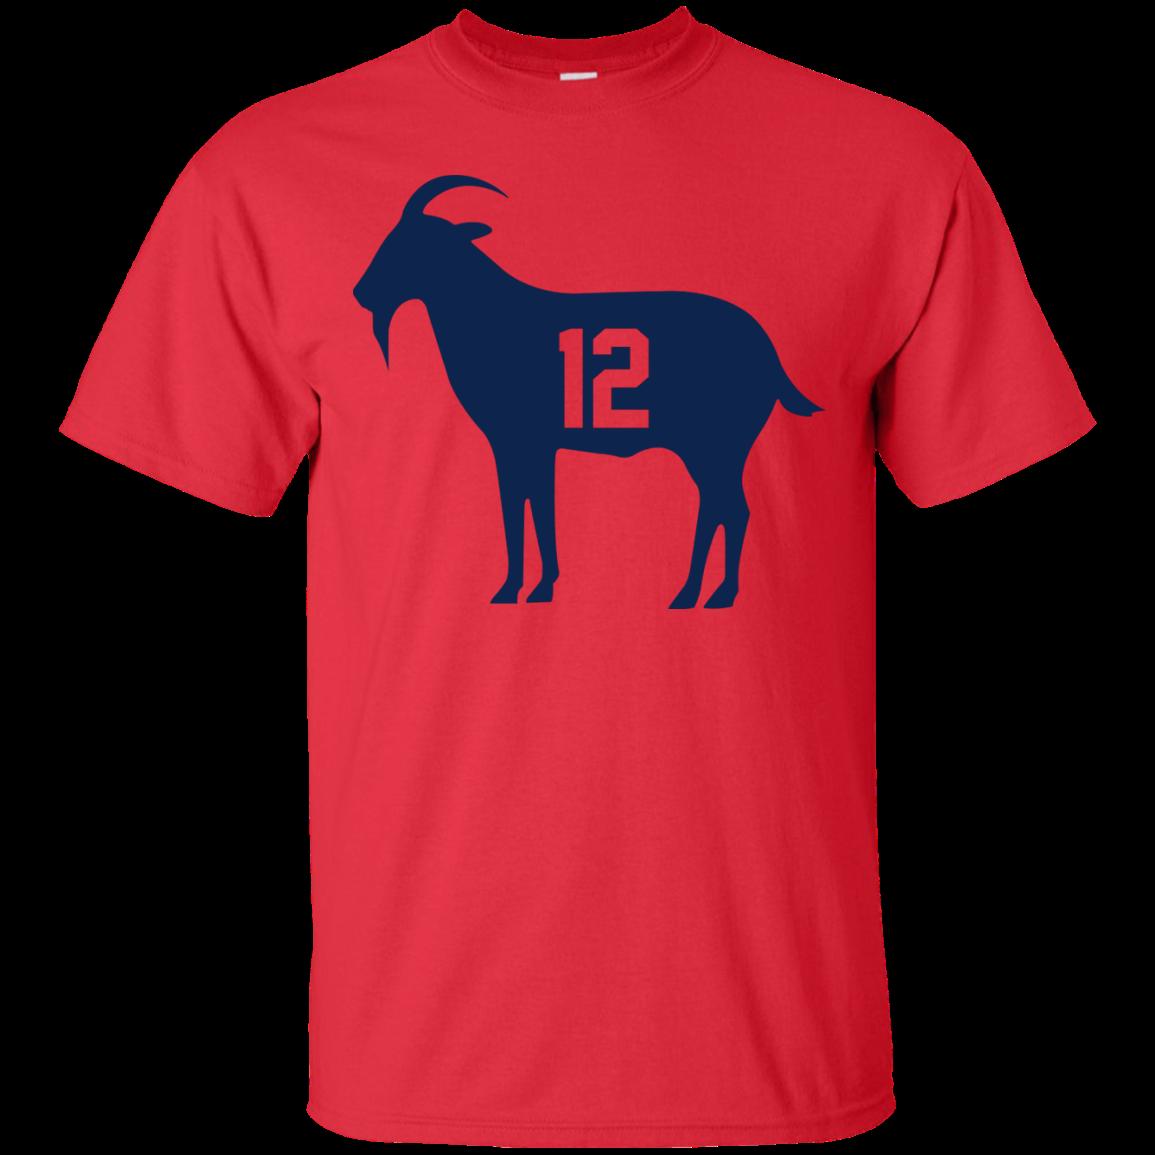 Goat Tb 12 Tom Brady T-Shirt eda20c6b7bbd